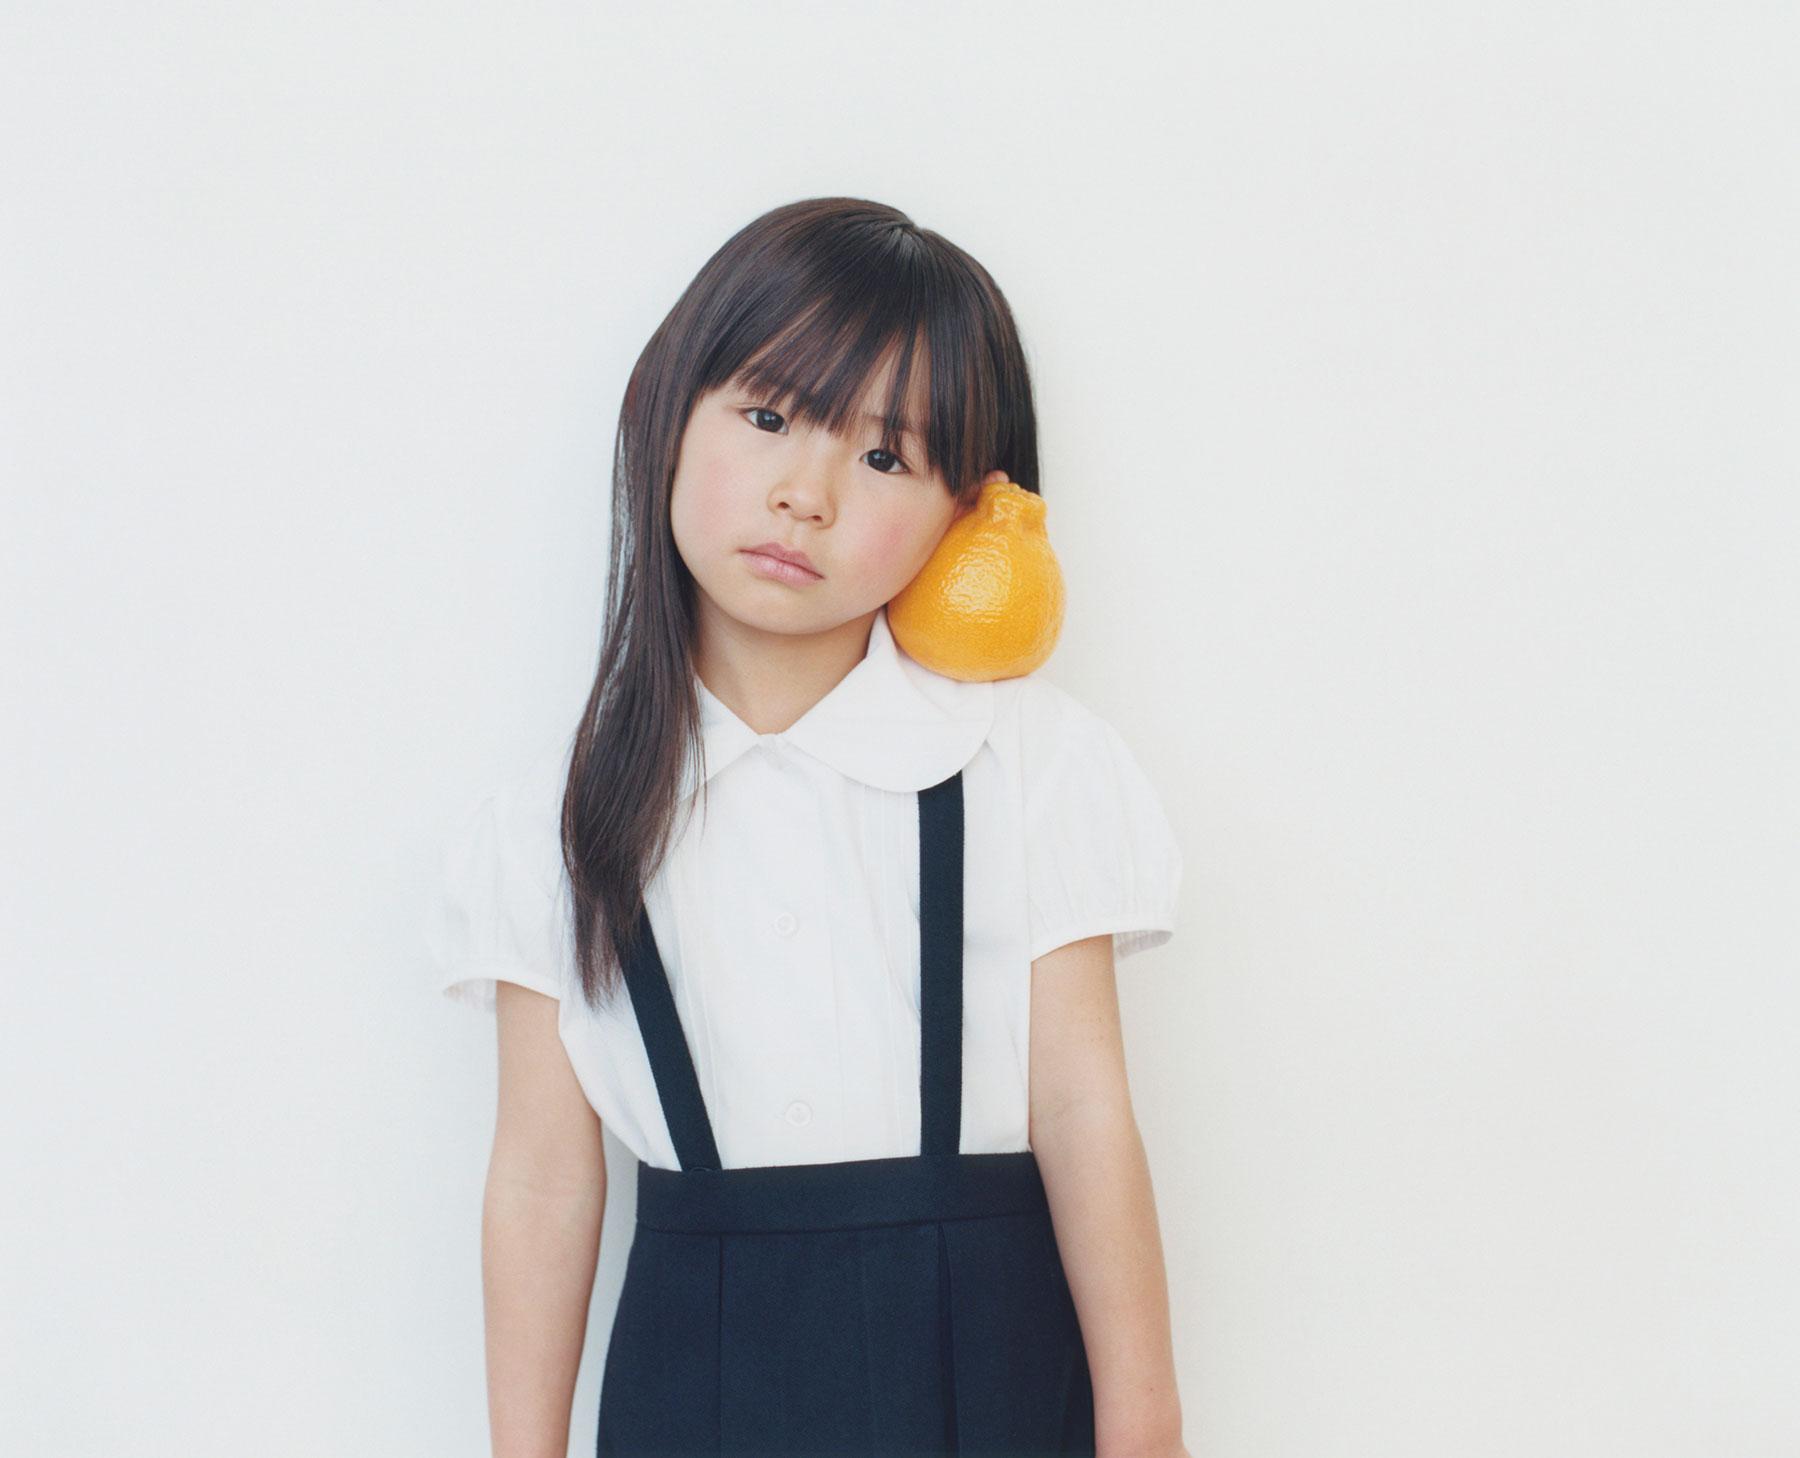 Osamu Yokonami,  1000 Children: Sumo Mandarin No. 24 , 2010-2013  Digital pigment print, 895 x 1105 mm (approx. 34.25 x 43.5 in), edition of 5; 146 x 168 mm (approx. 5.75 x 6.6 in), edition of 10   Inquire